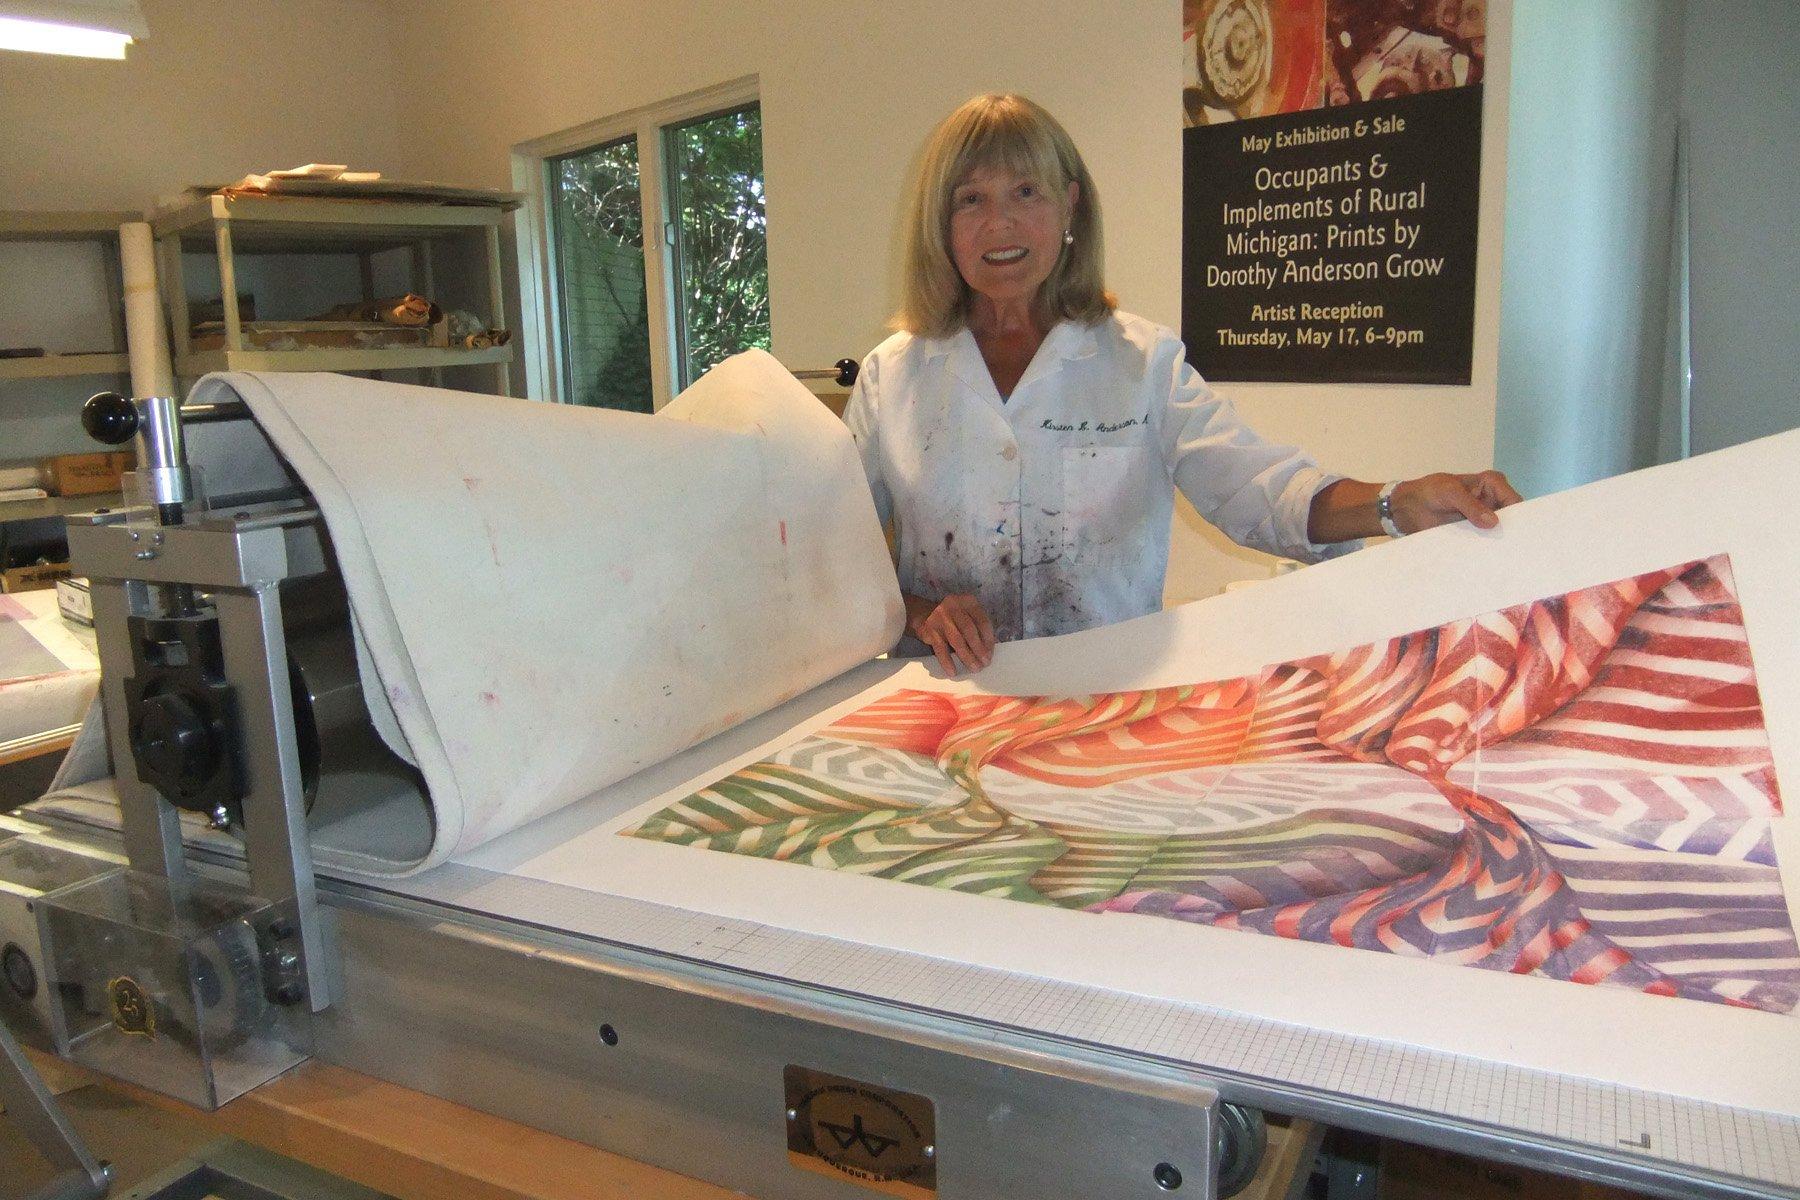 Dorothy Anderson Grow, Artist